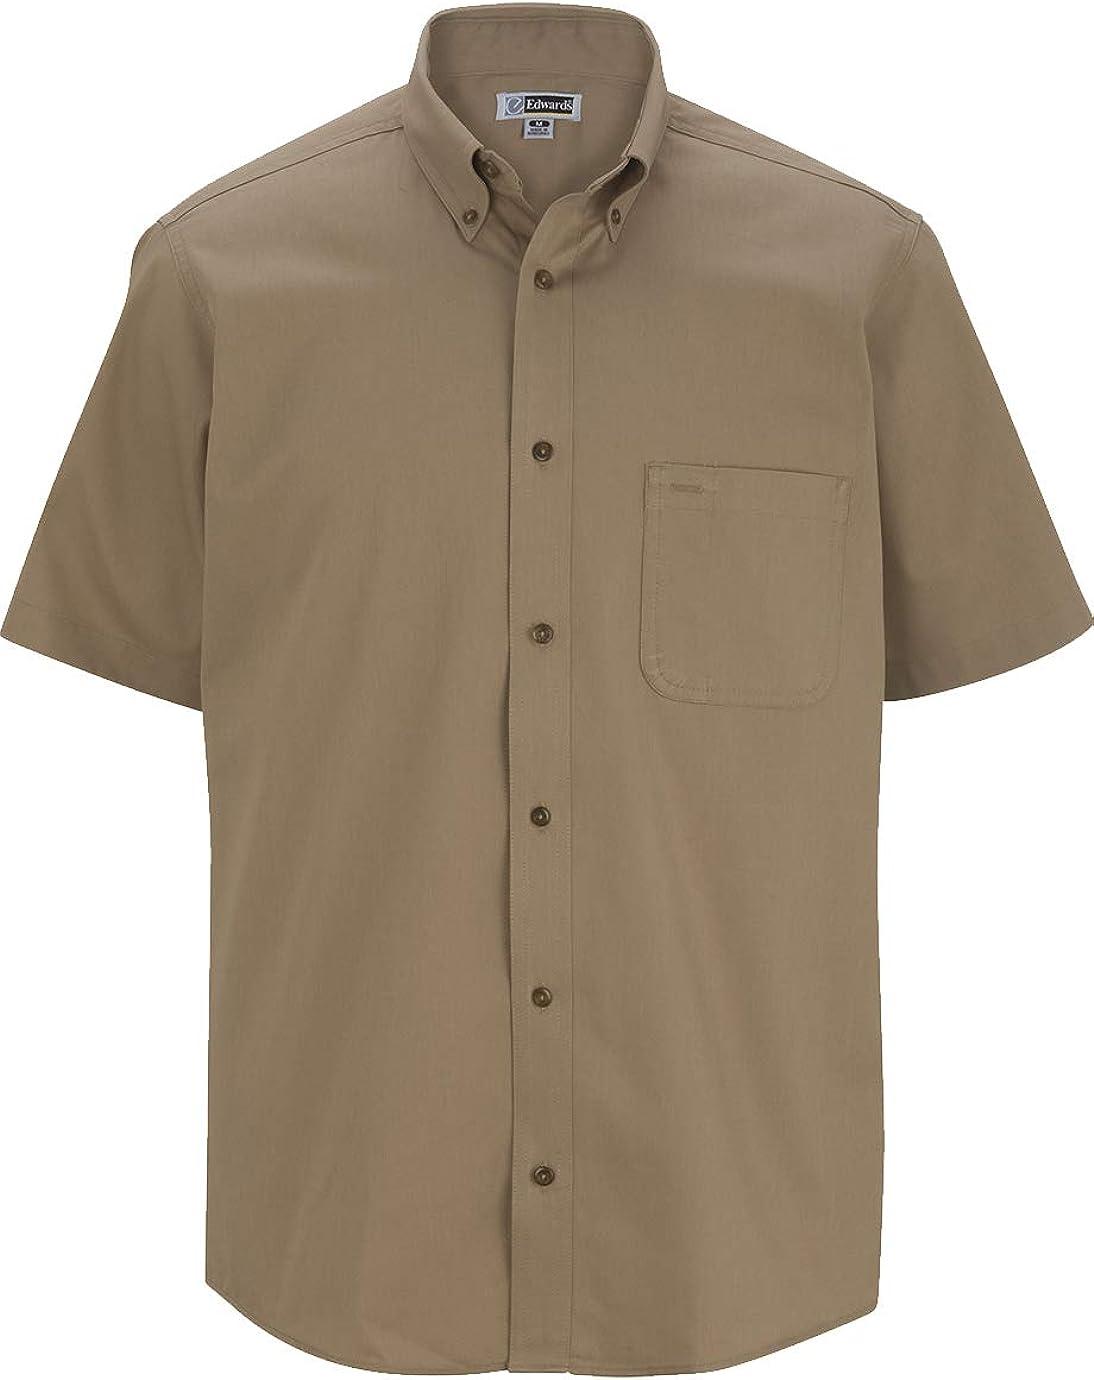 Edwards Men's Cottonplus Short Sleeve Twill Shirt